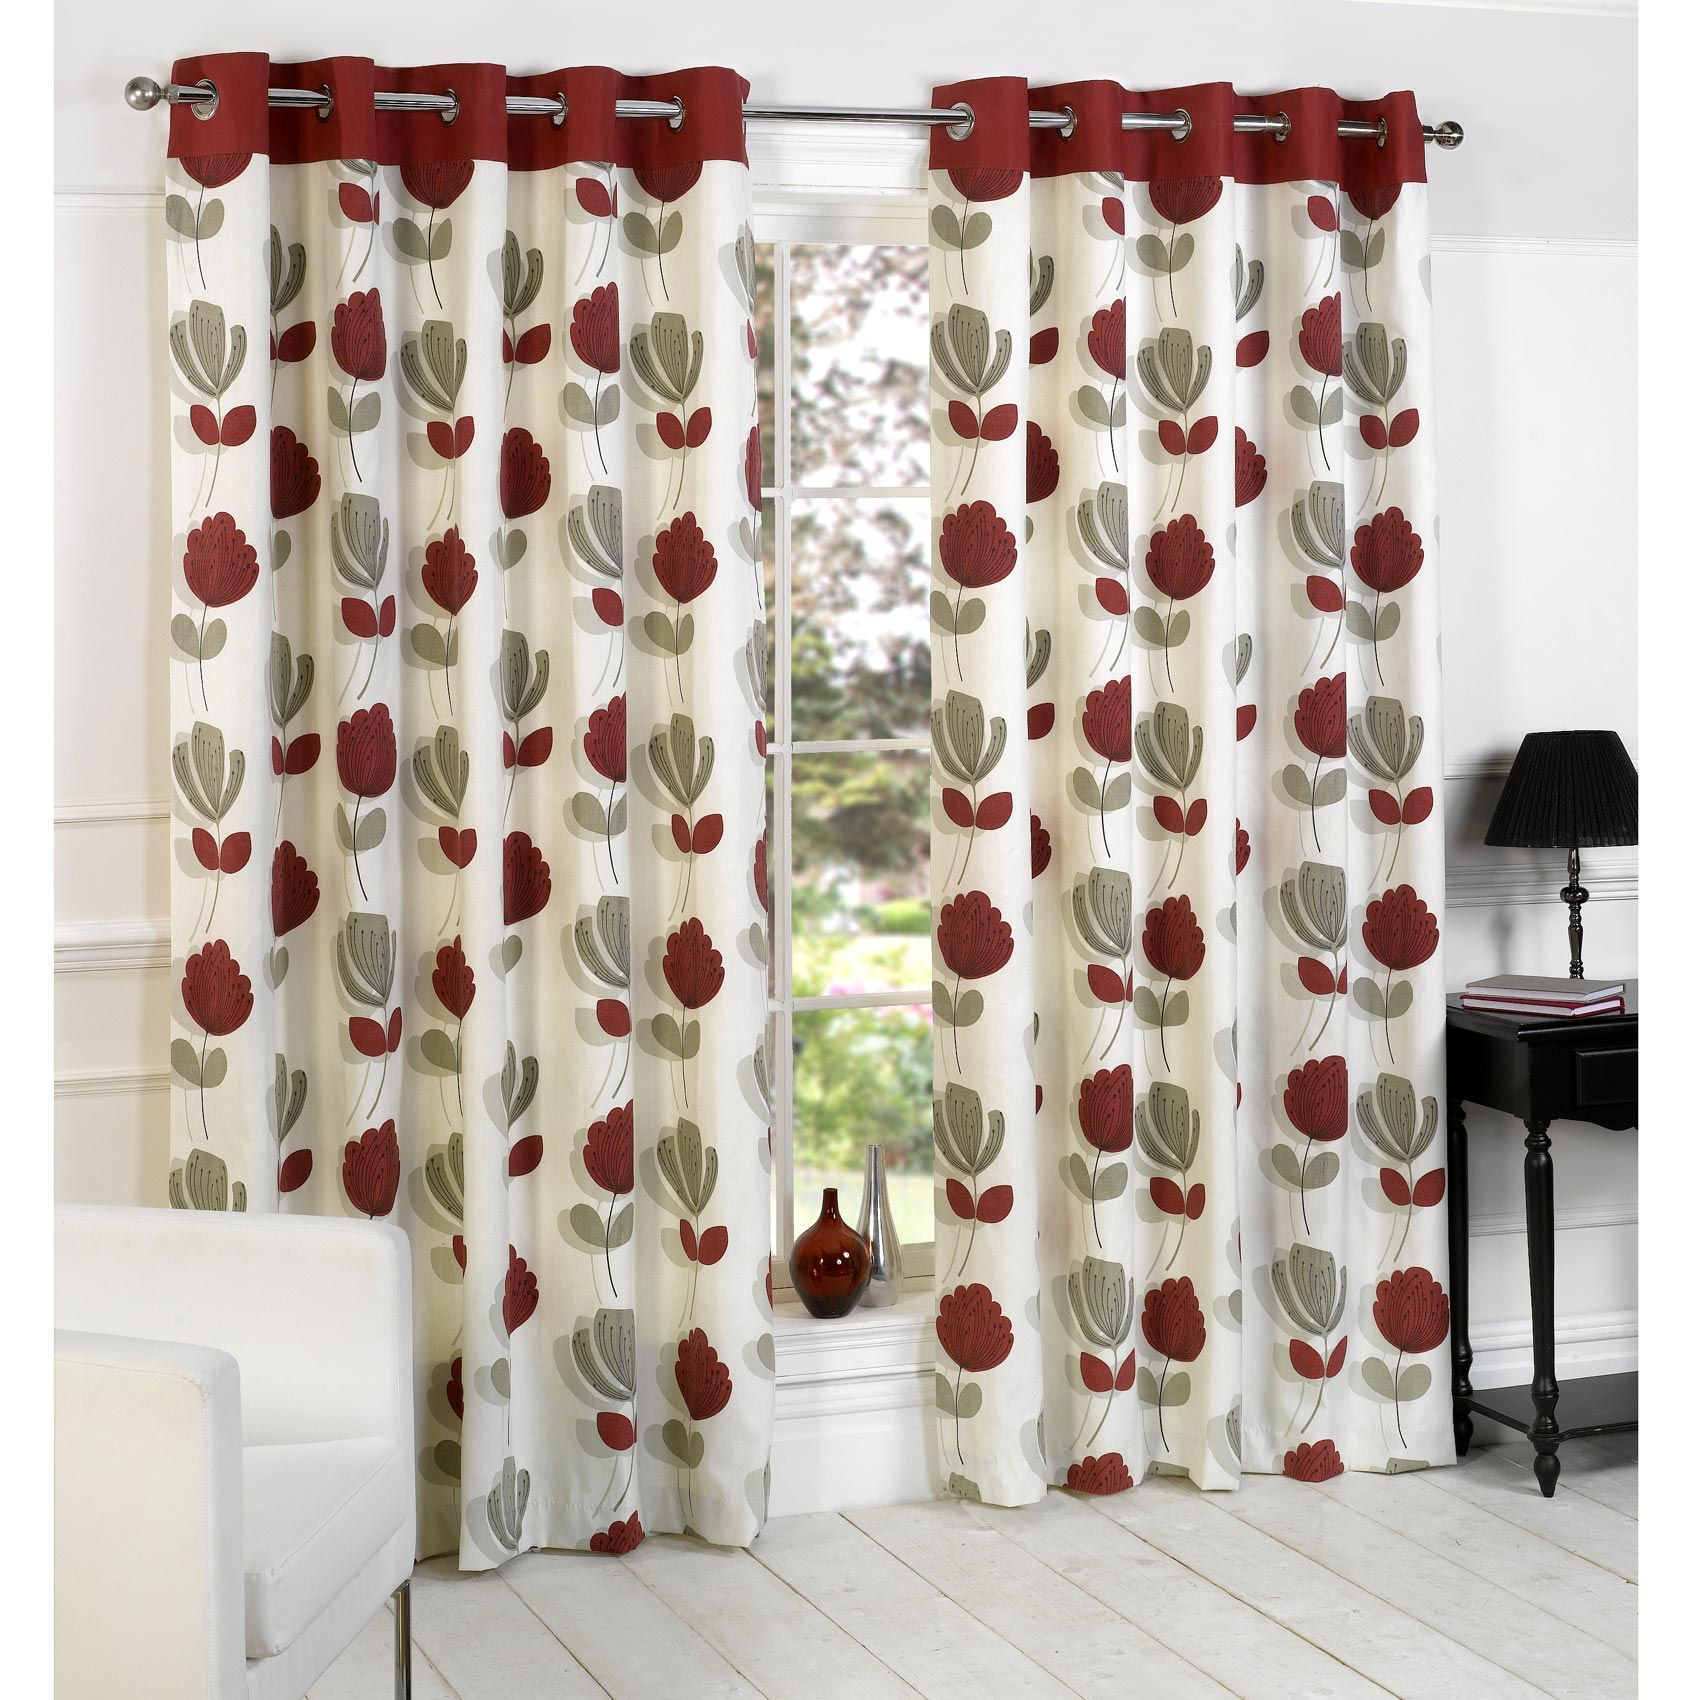 Lotti Modern Floral Print Eyelet Curtains Cream Red Cortinas